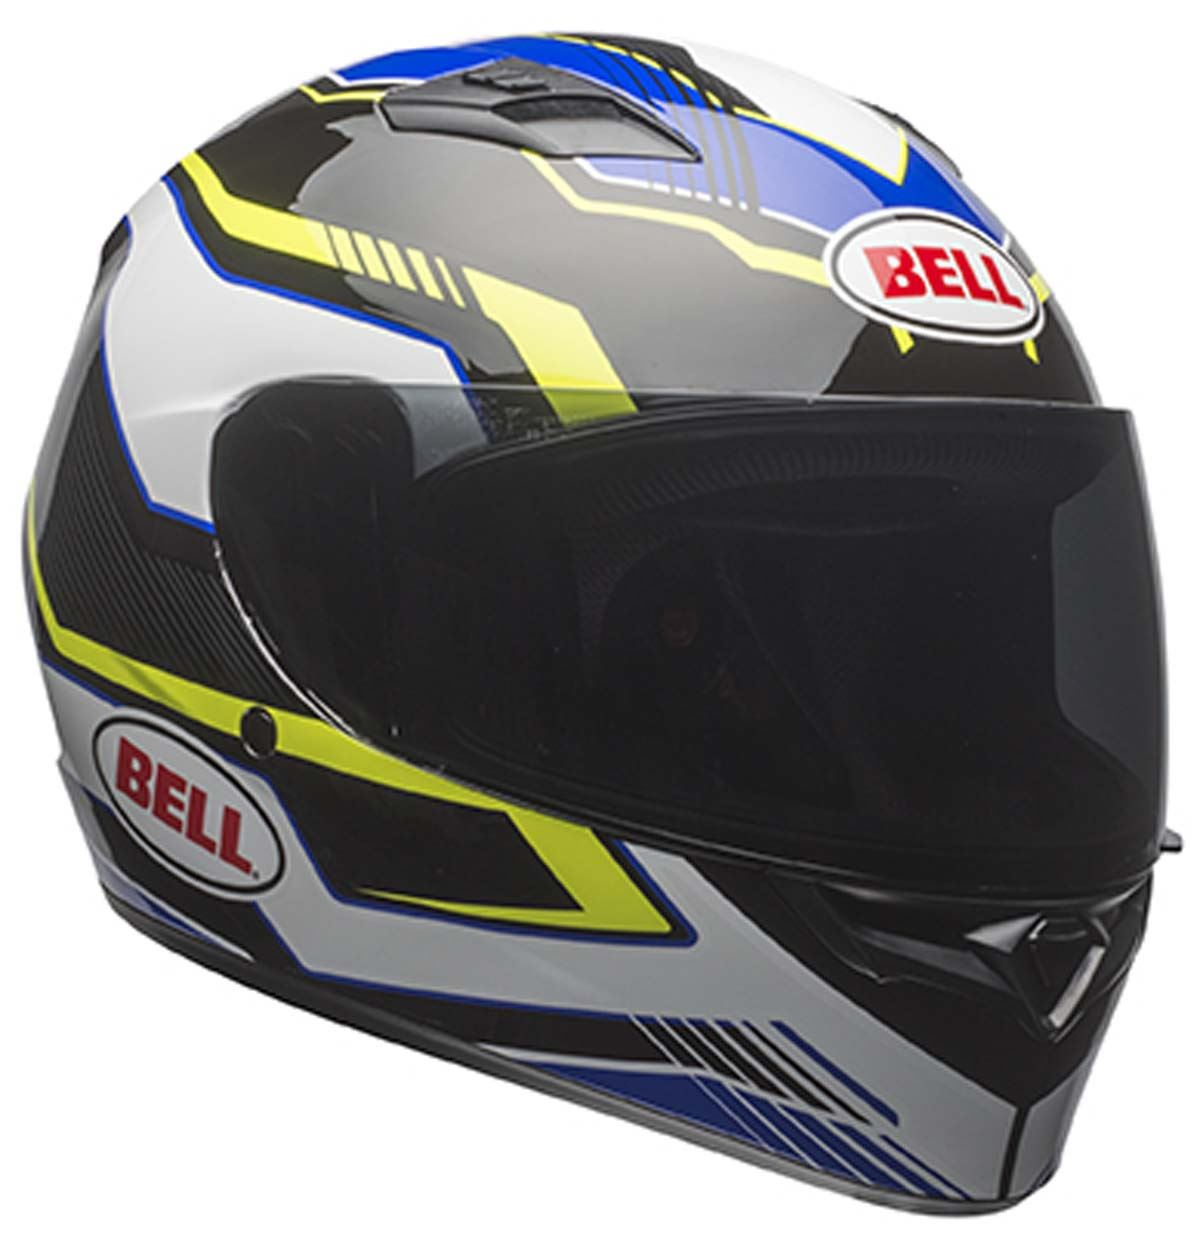 Bell-Qualifier-Helmet-Full-Face-Motorcycle-Clear-Shield-DOT-XS-3XL miniature 23